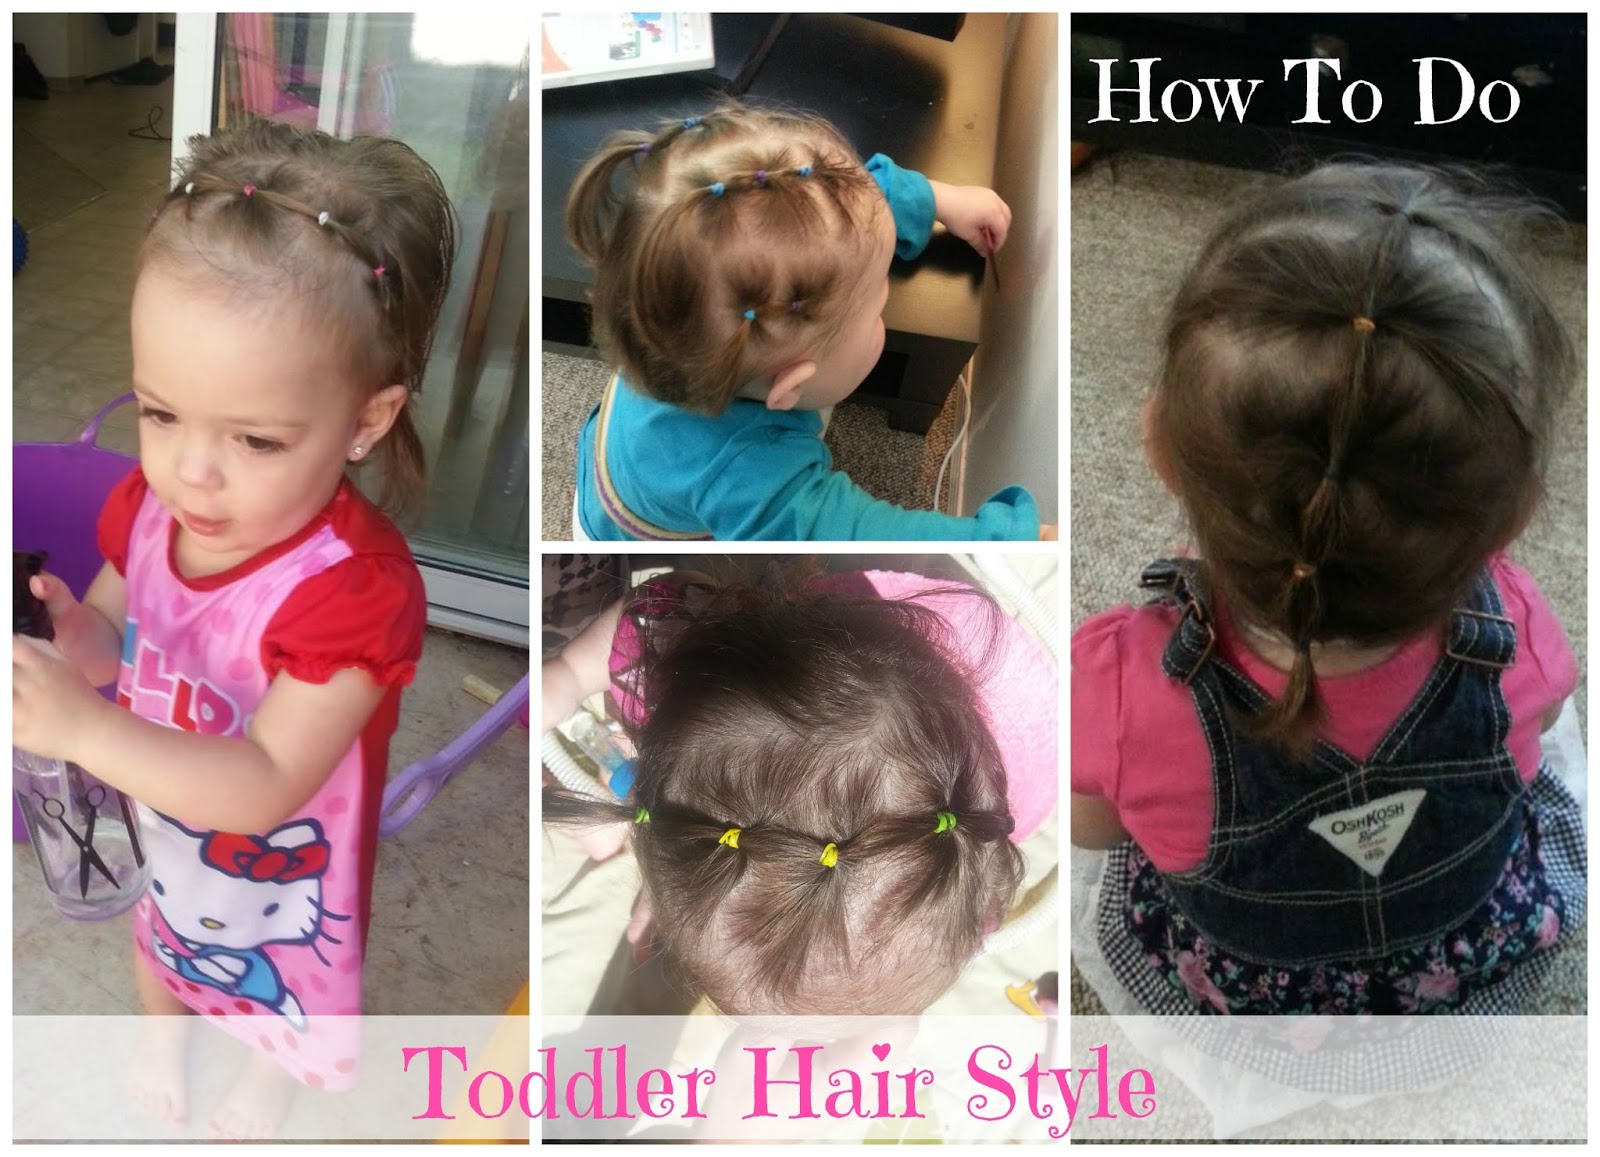 h&h harris family journey: toddler hair style demonstration